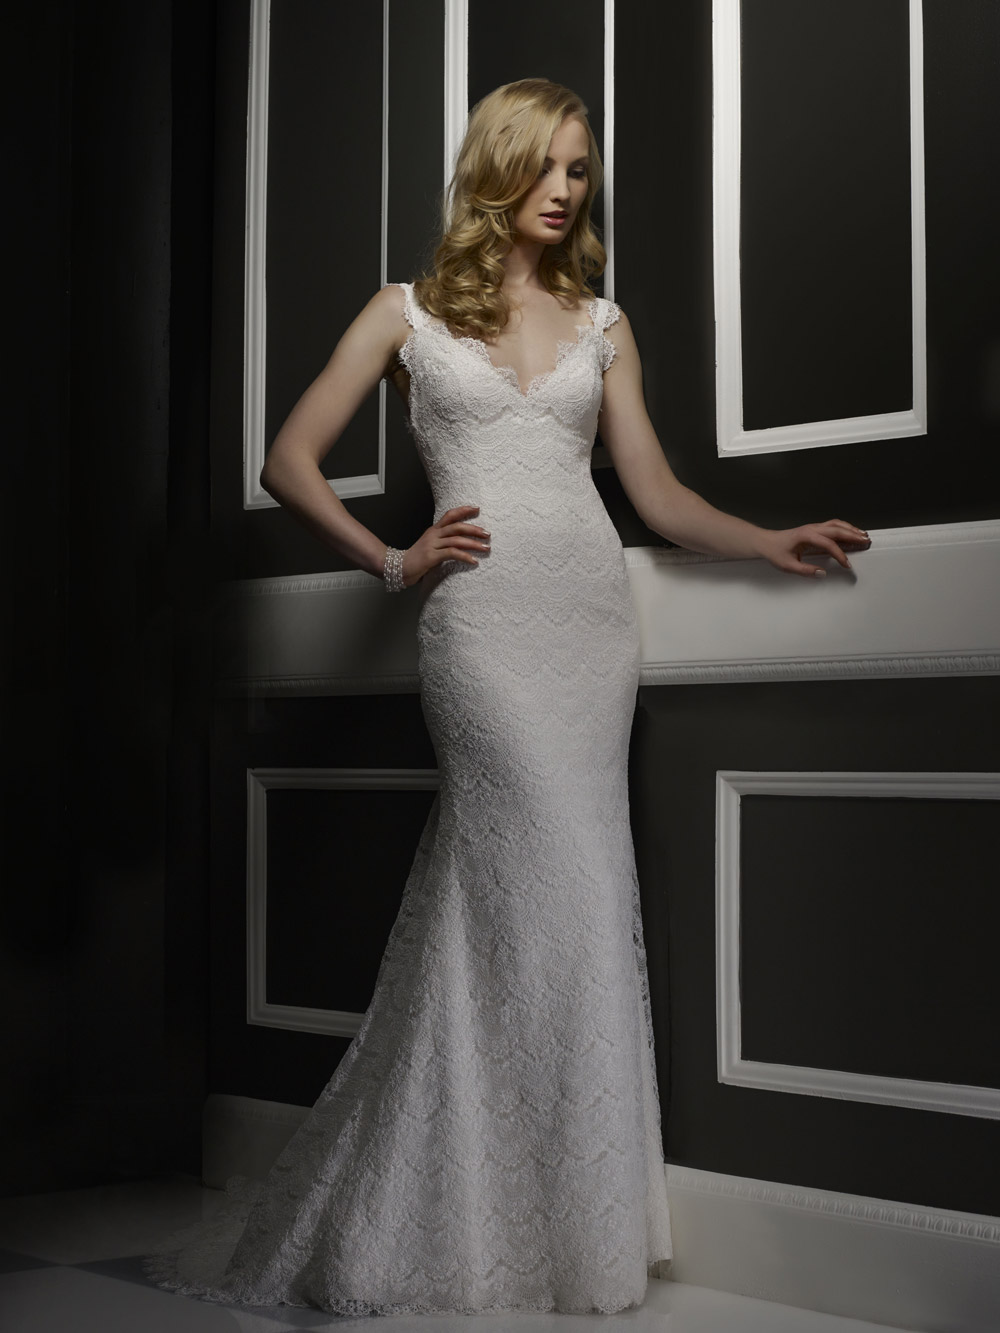 robert bullock wedding dresses richmond va Avery